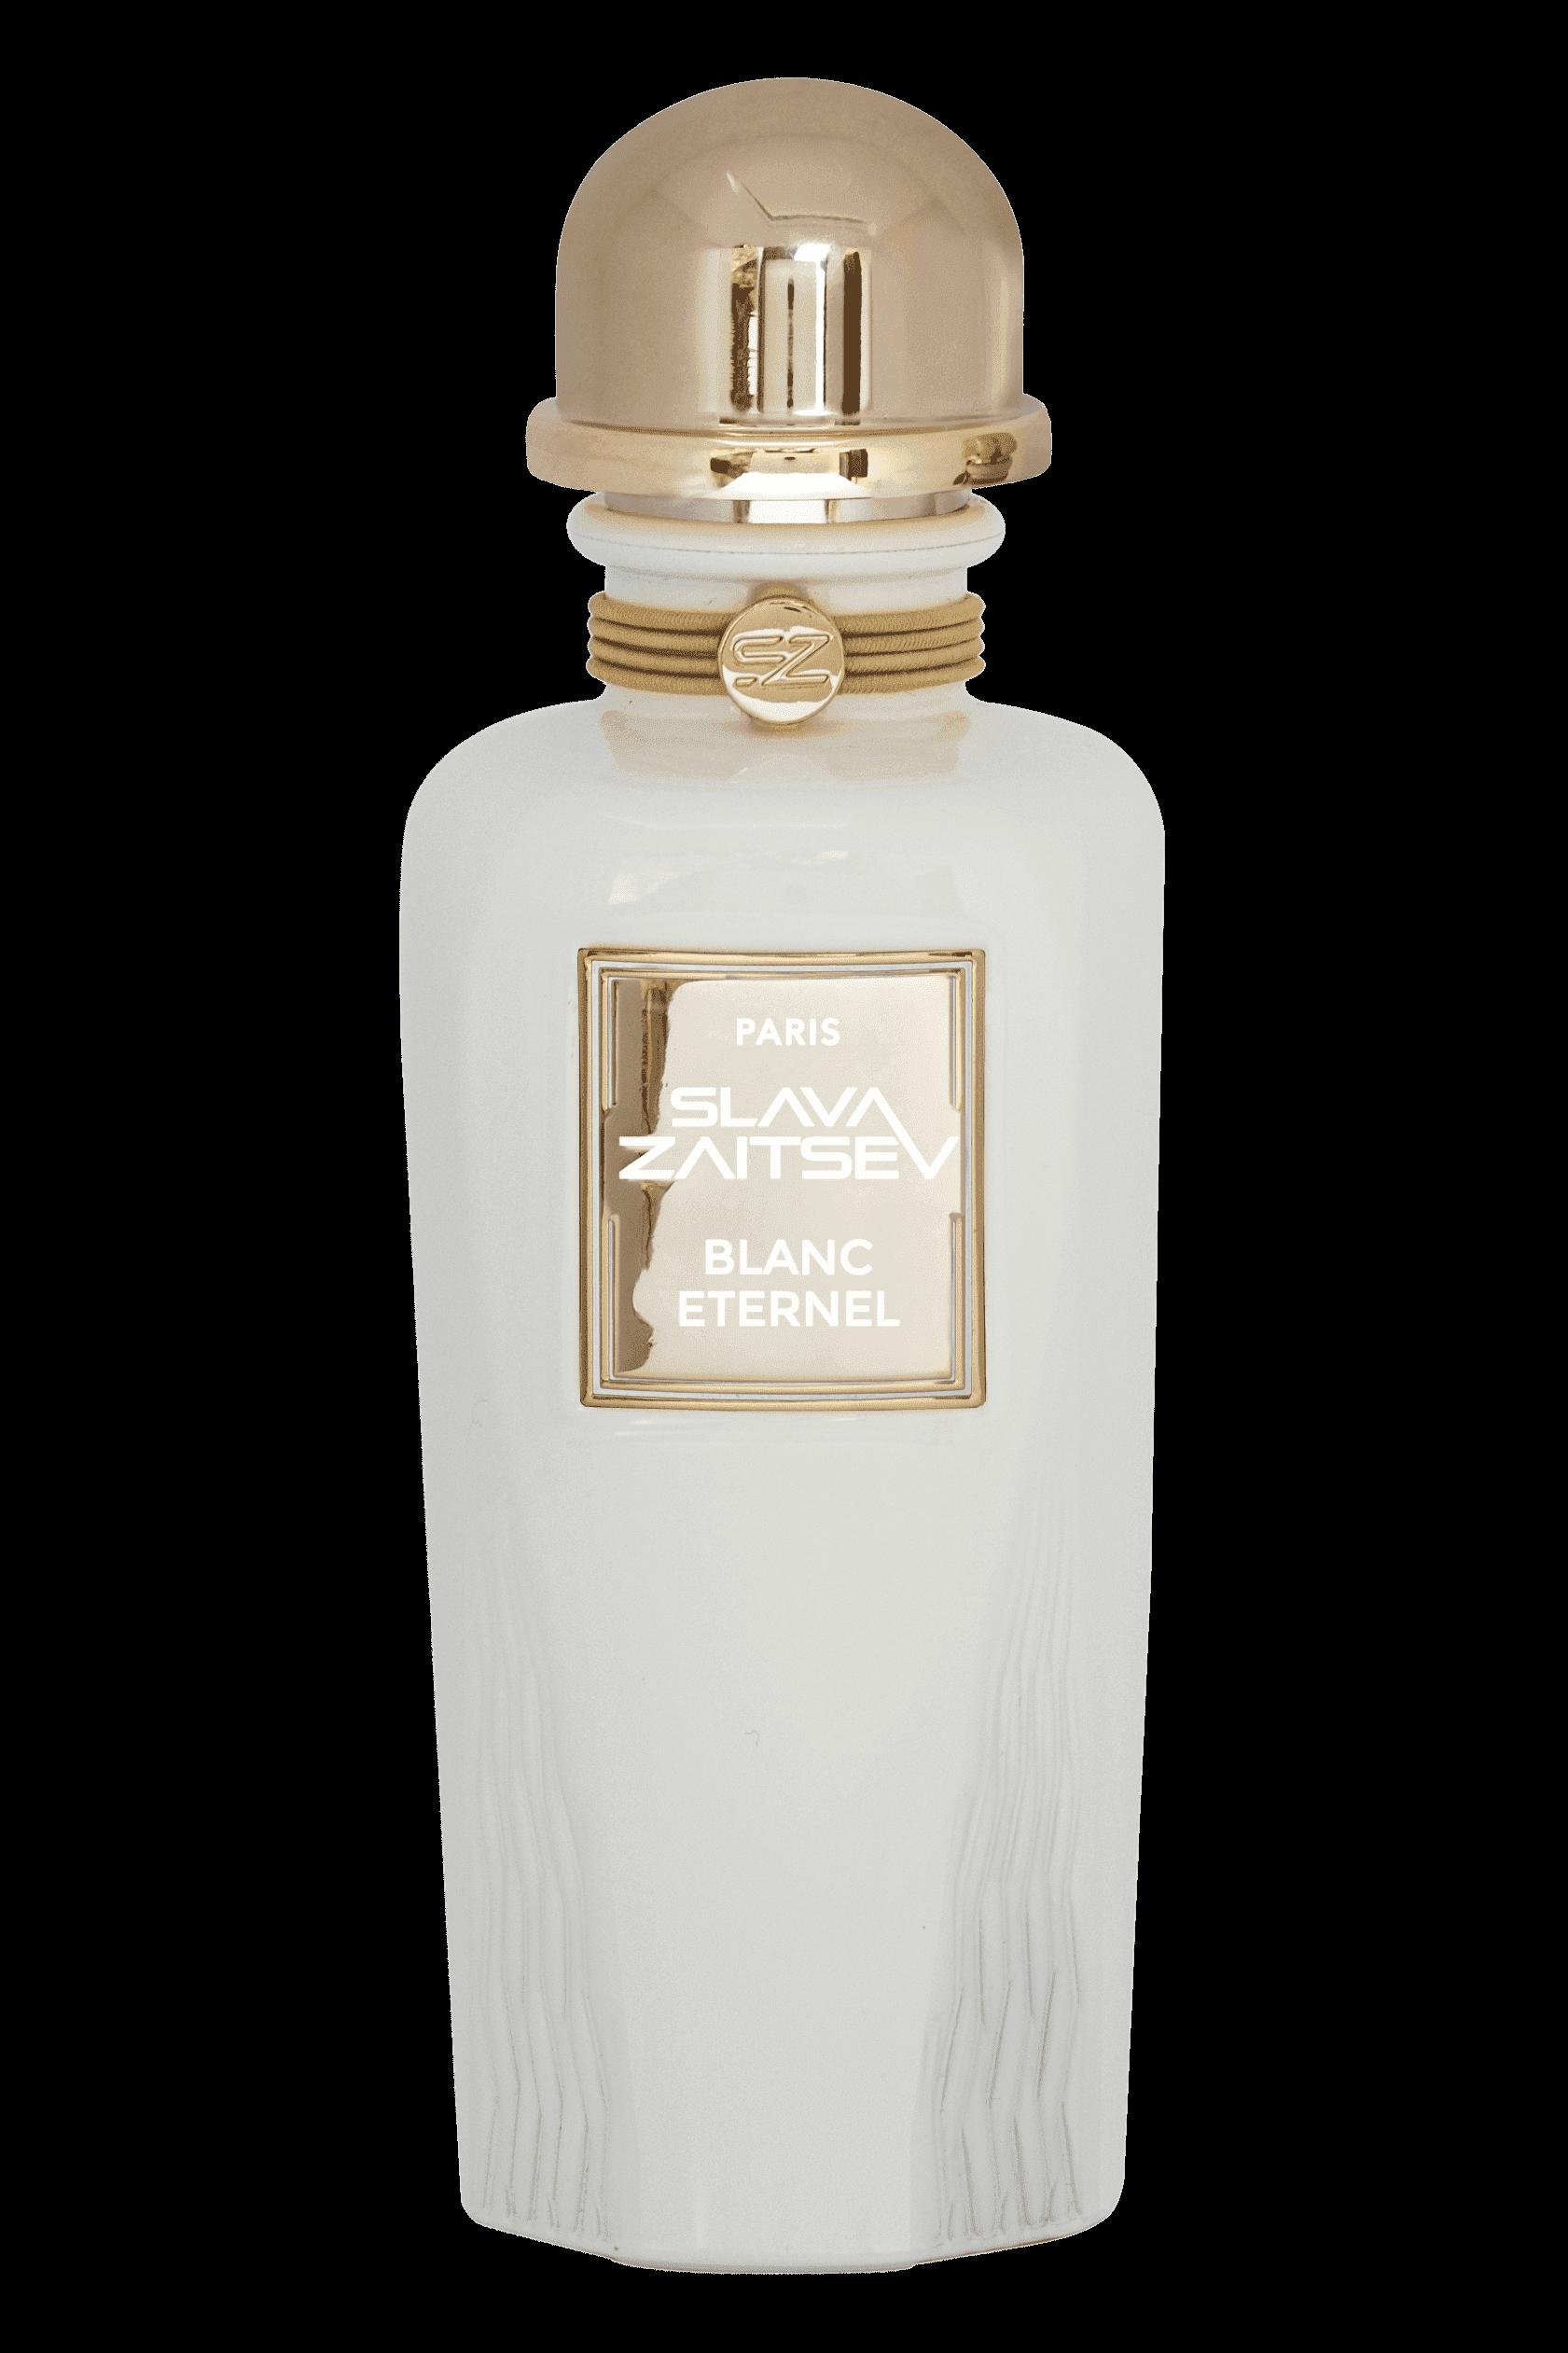 Флакон духов Слава Зайцев Blanc eternel